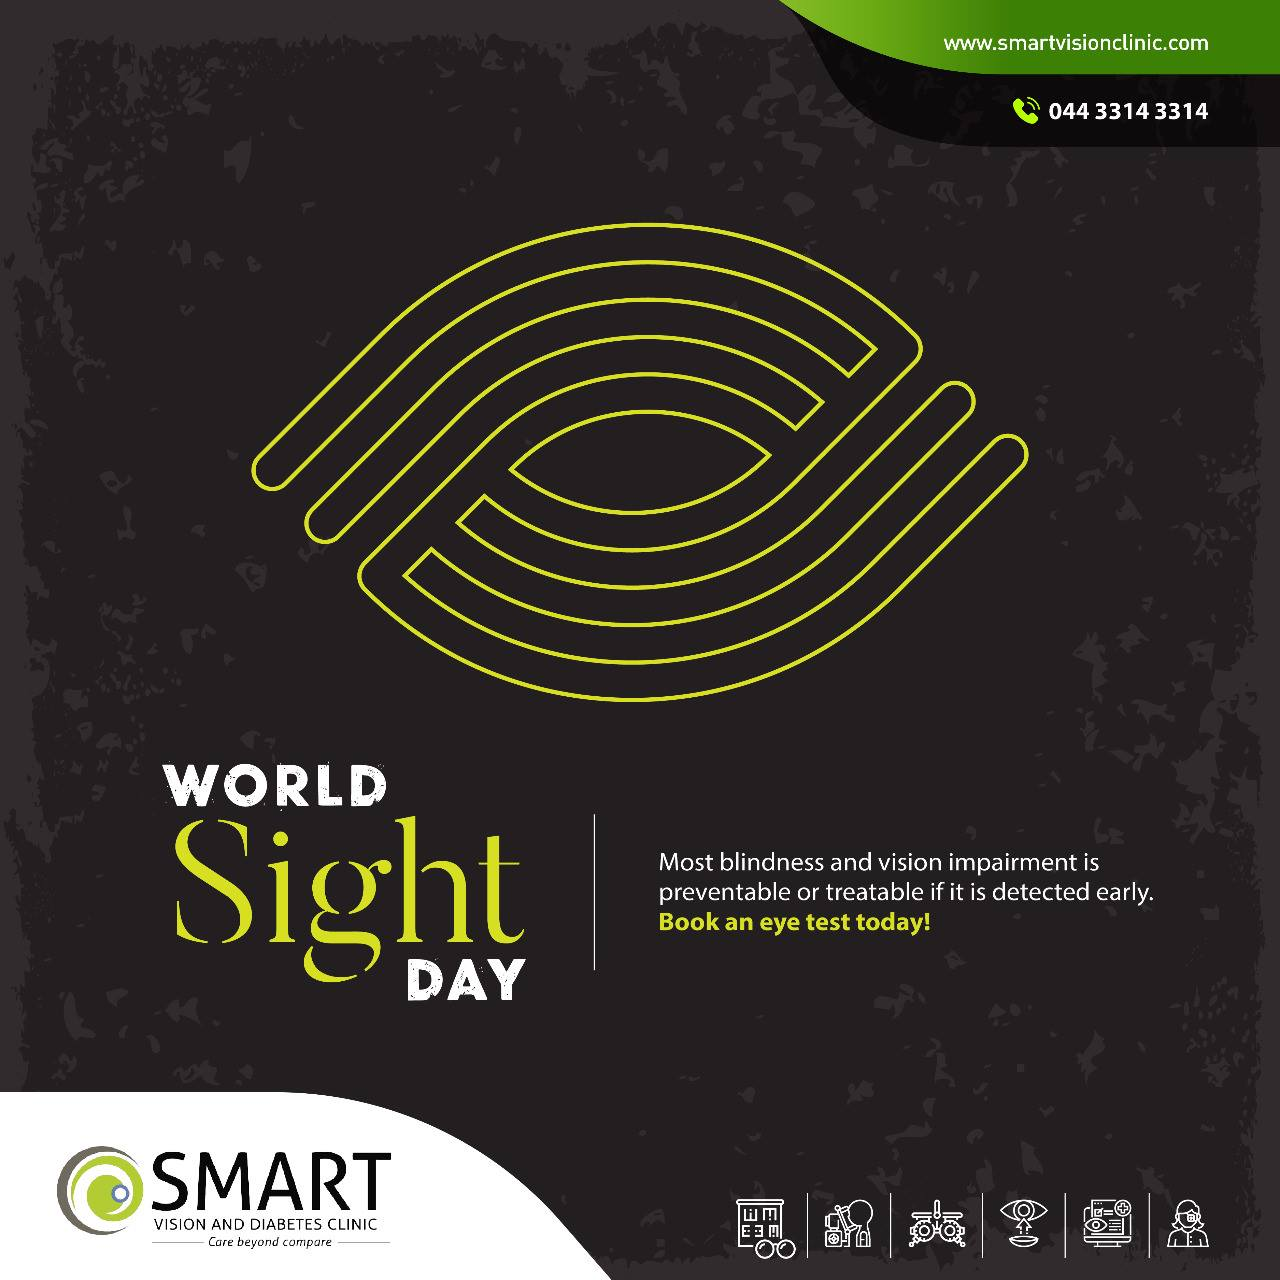 World sight day 2018 | SMARTVISIONCLINIC